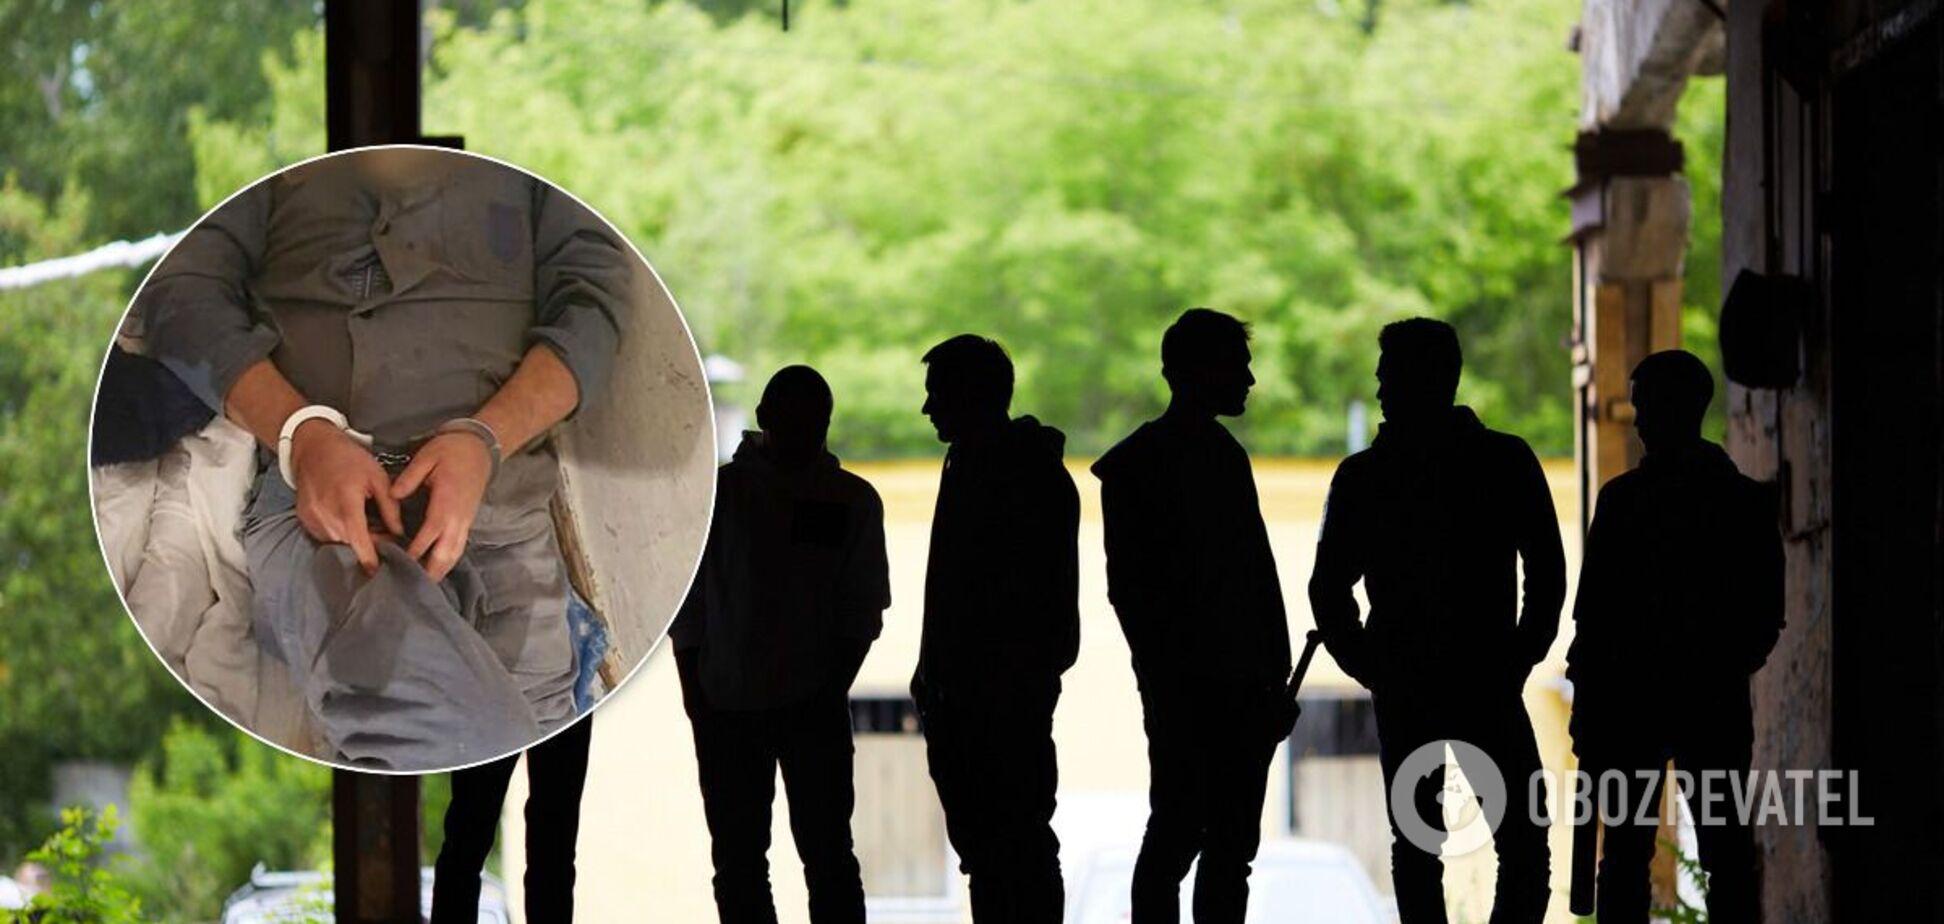 В Киеве банда похитила мужчину из синагоги